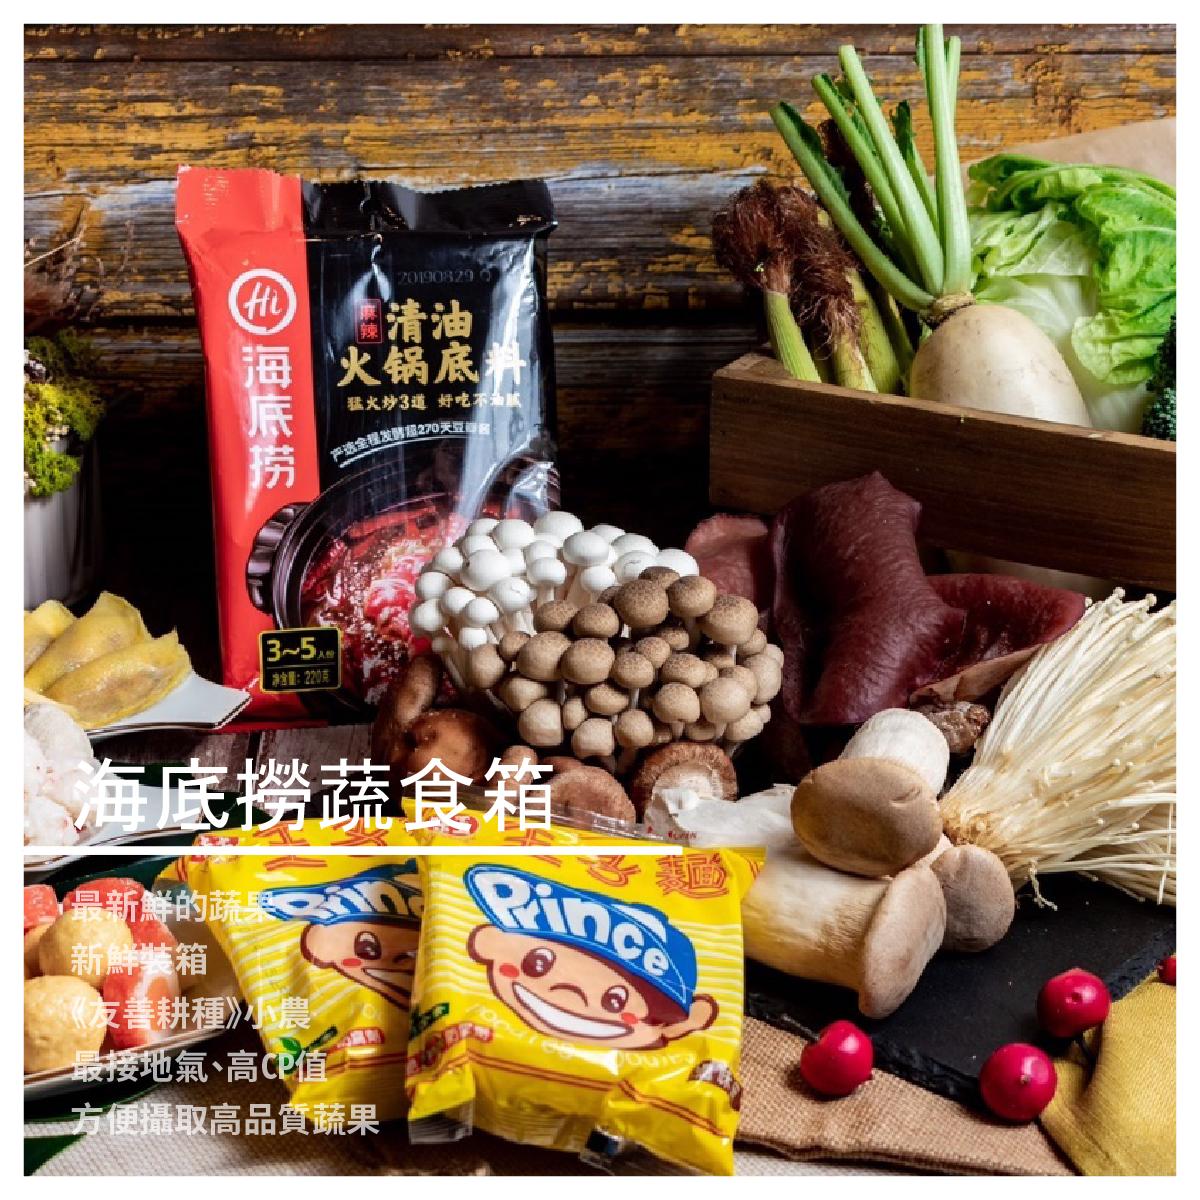 【JD7生活蔬果箱】海底撈蔬食箱